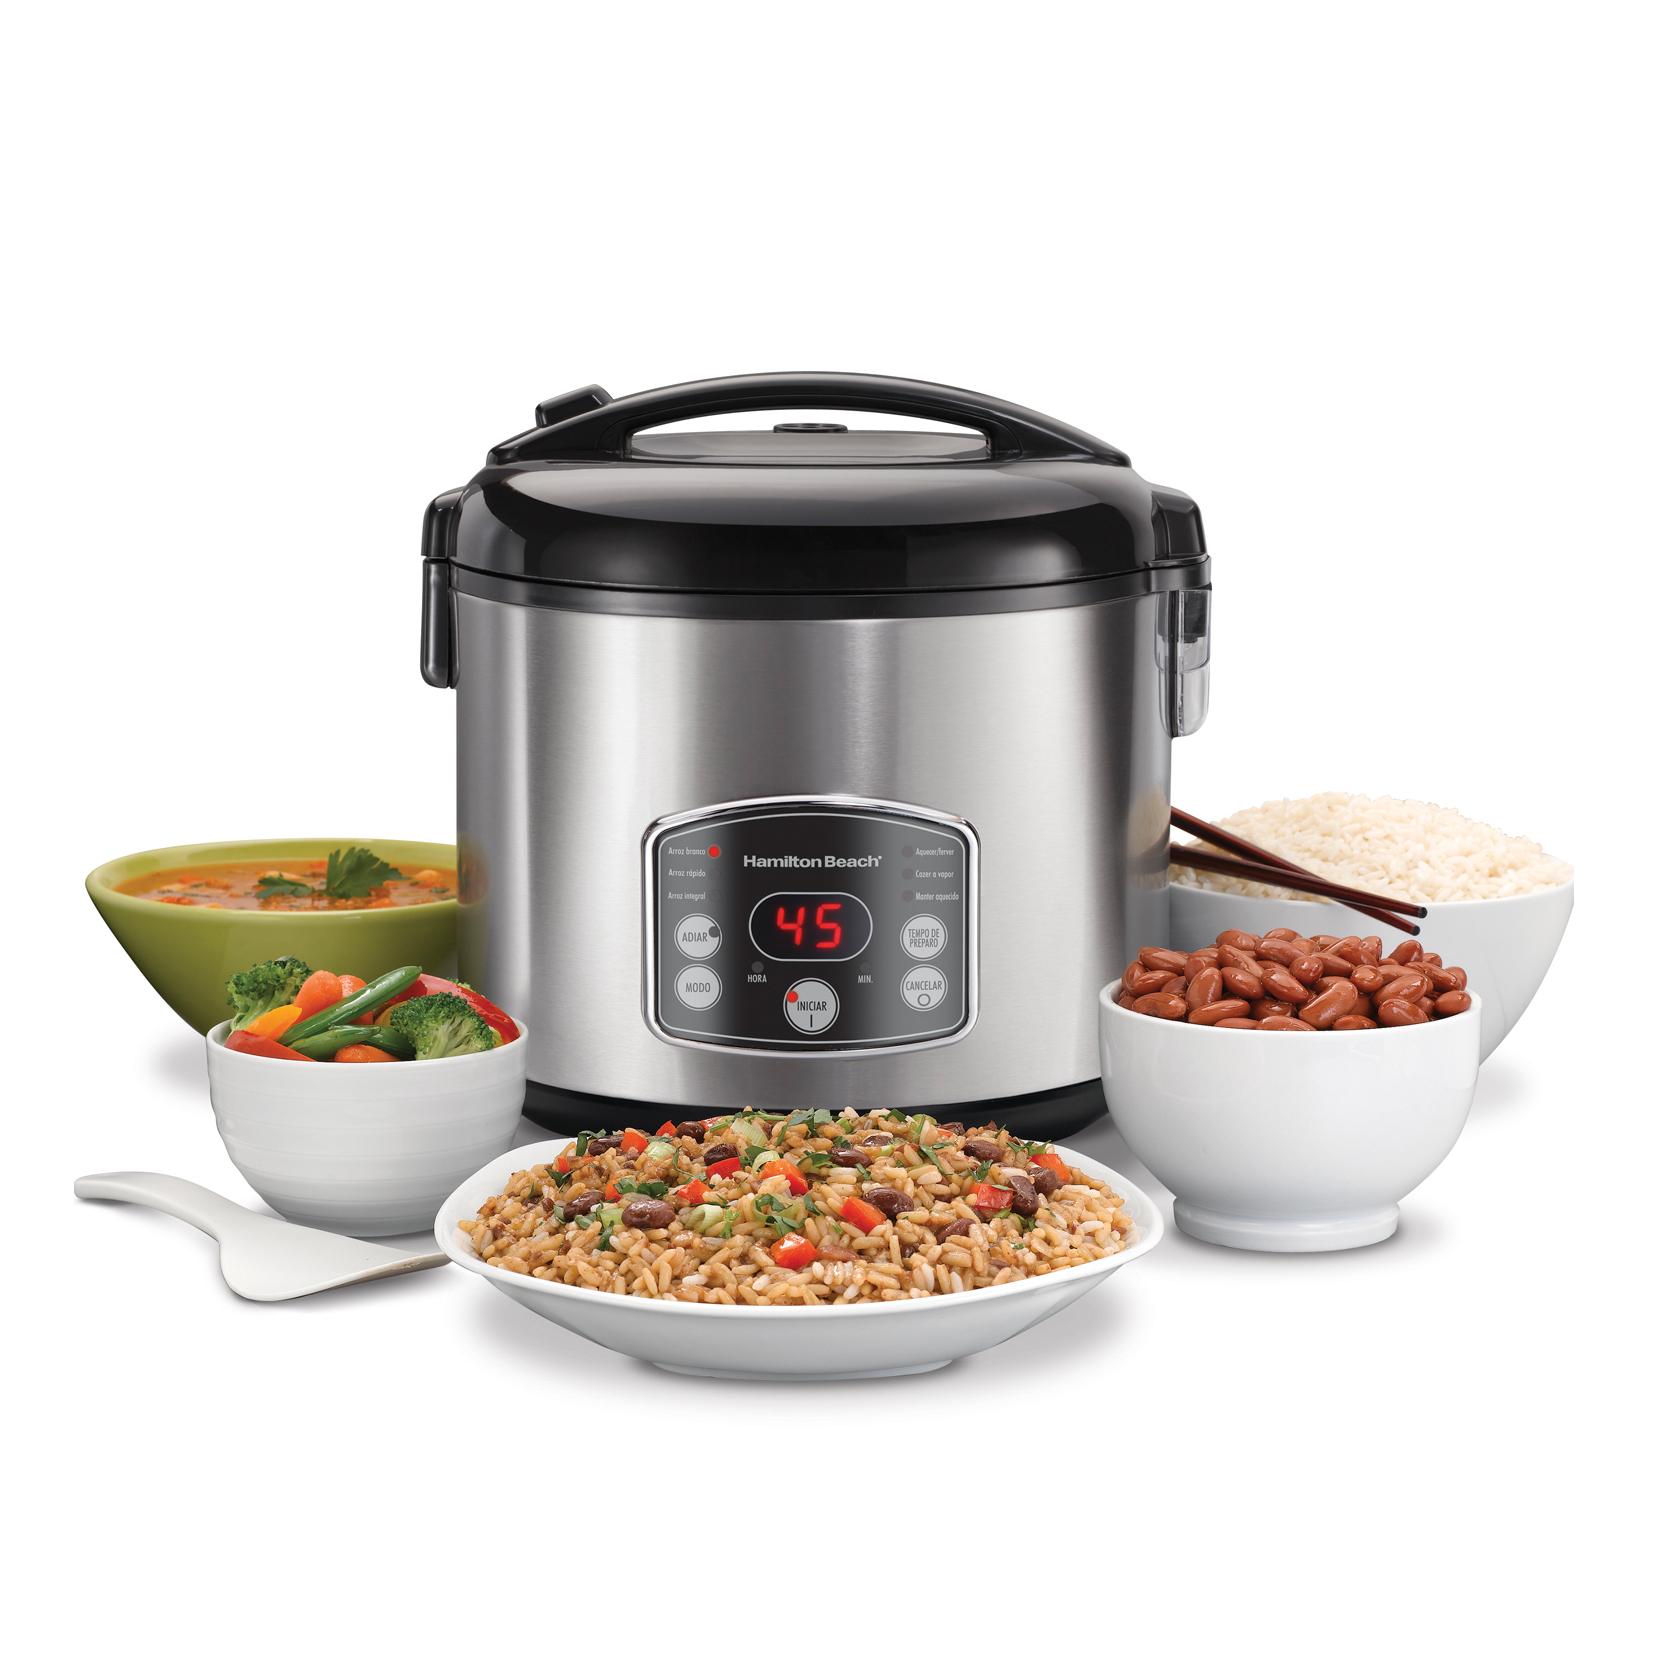 hamilton beach rice cooker instructions 37541